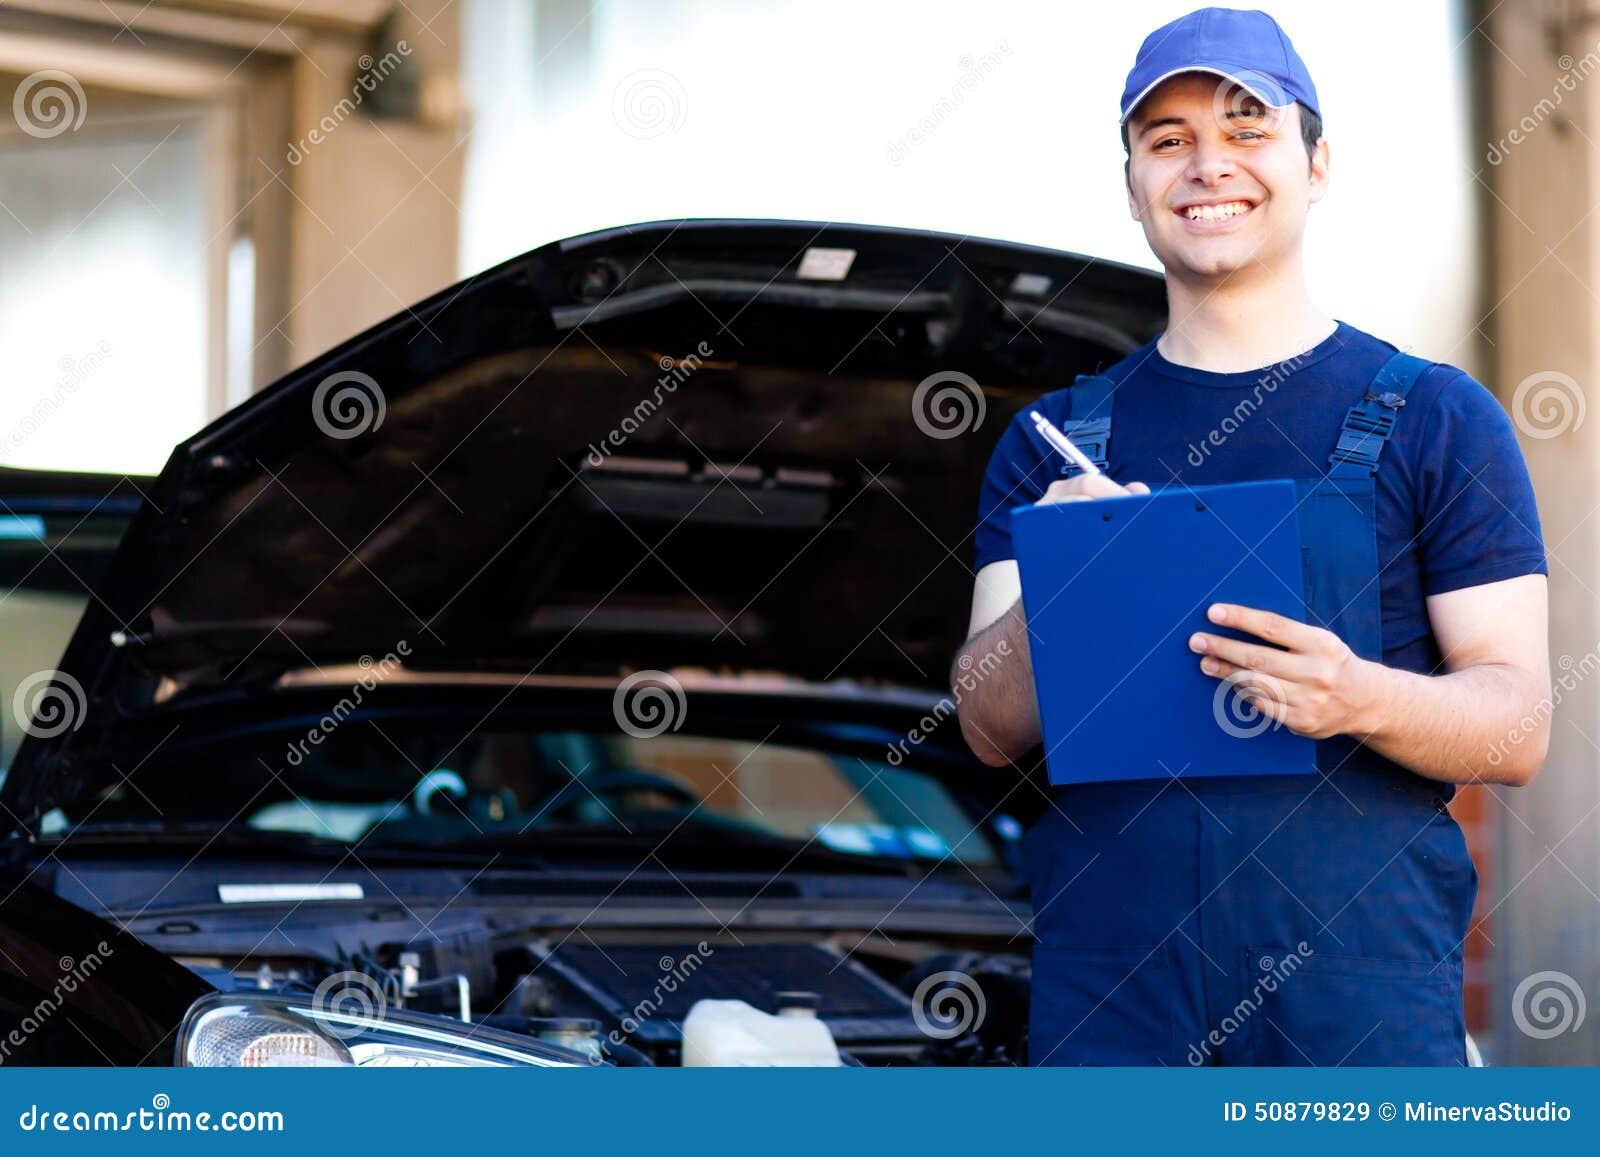 photo essay mechanics